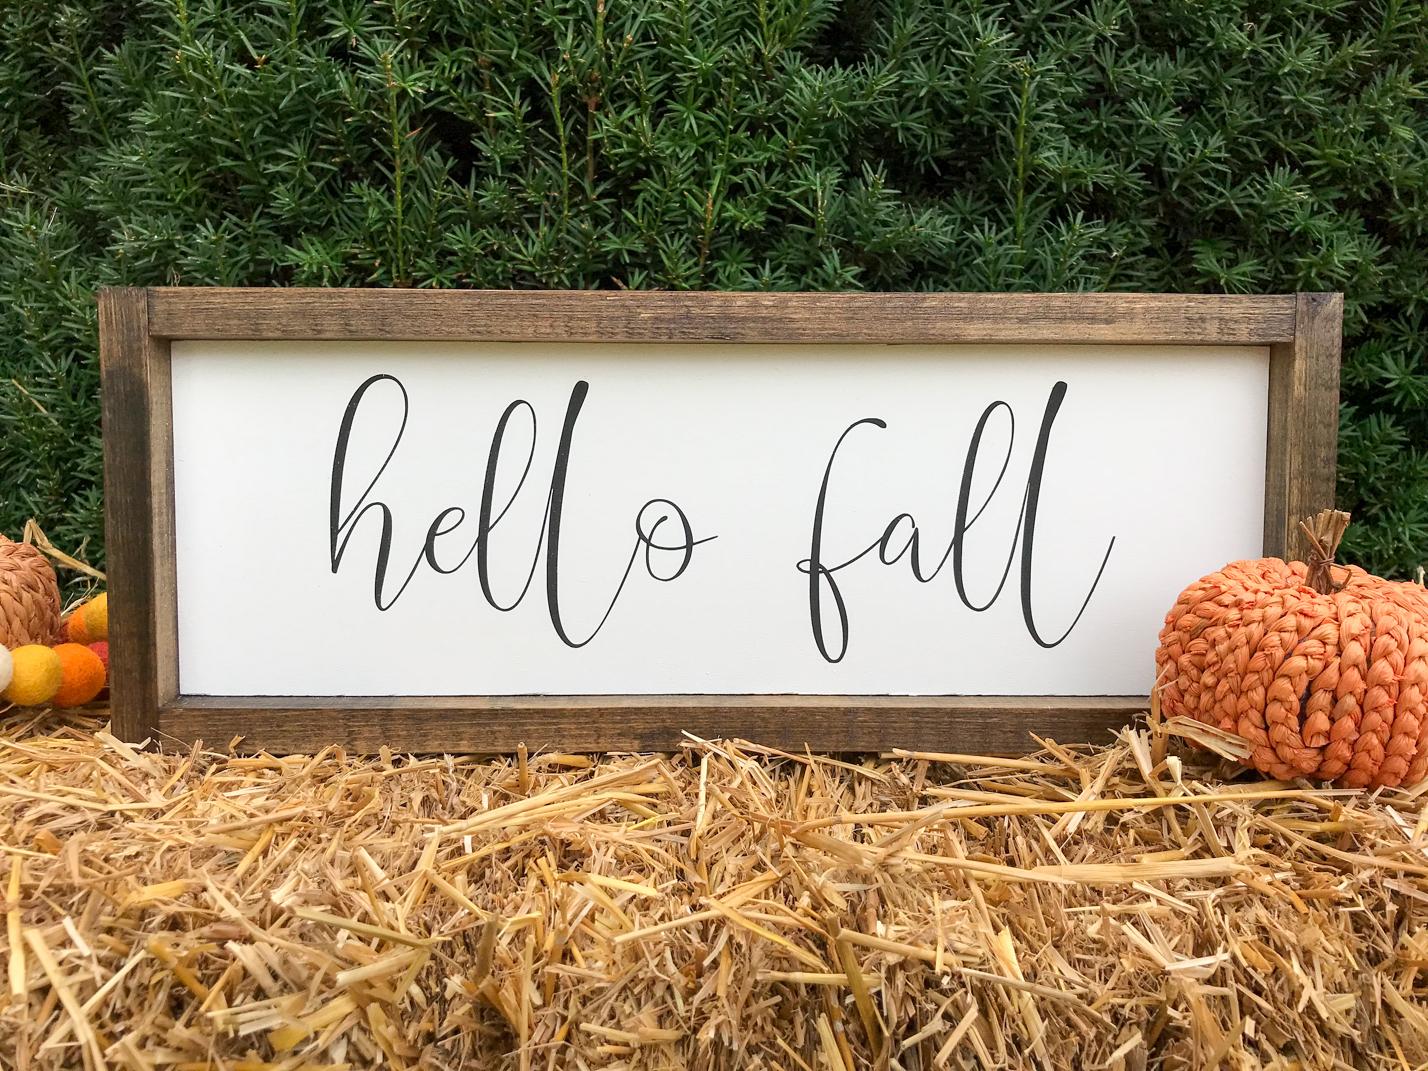 Hello Fall Farmhouse Fall sign for your home decor.